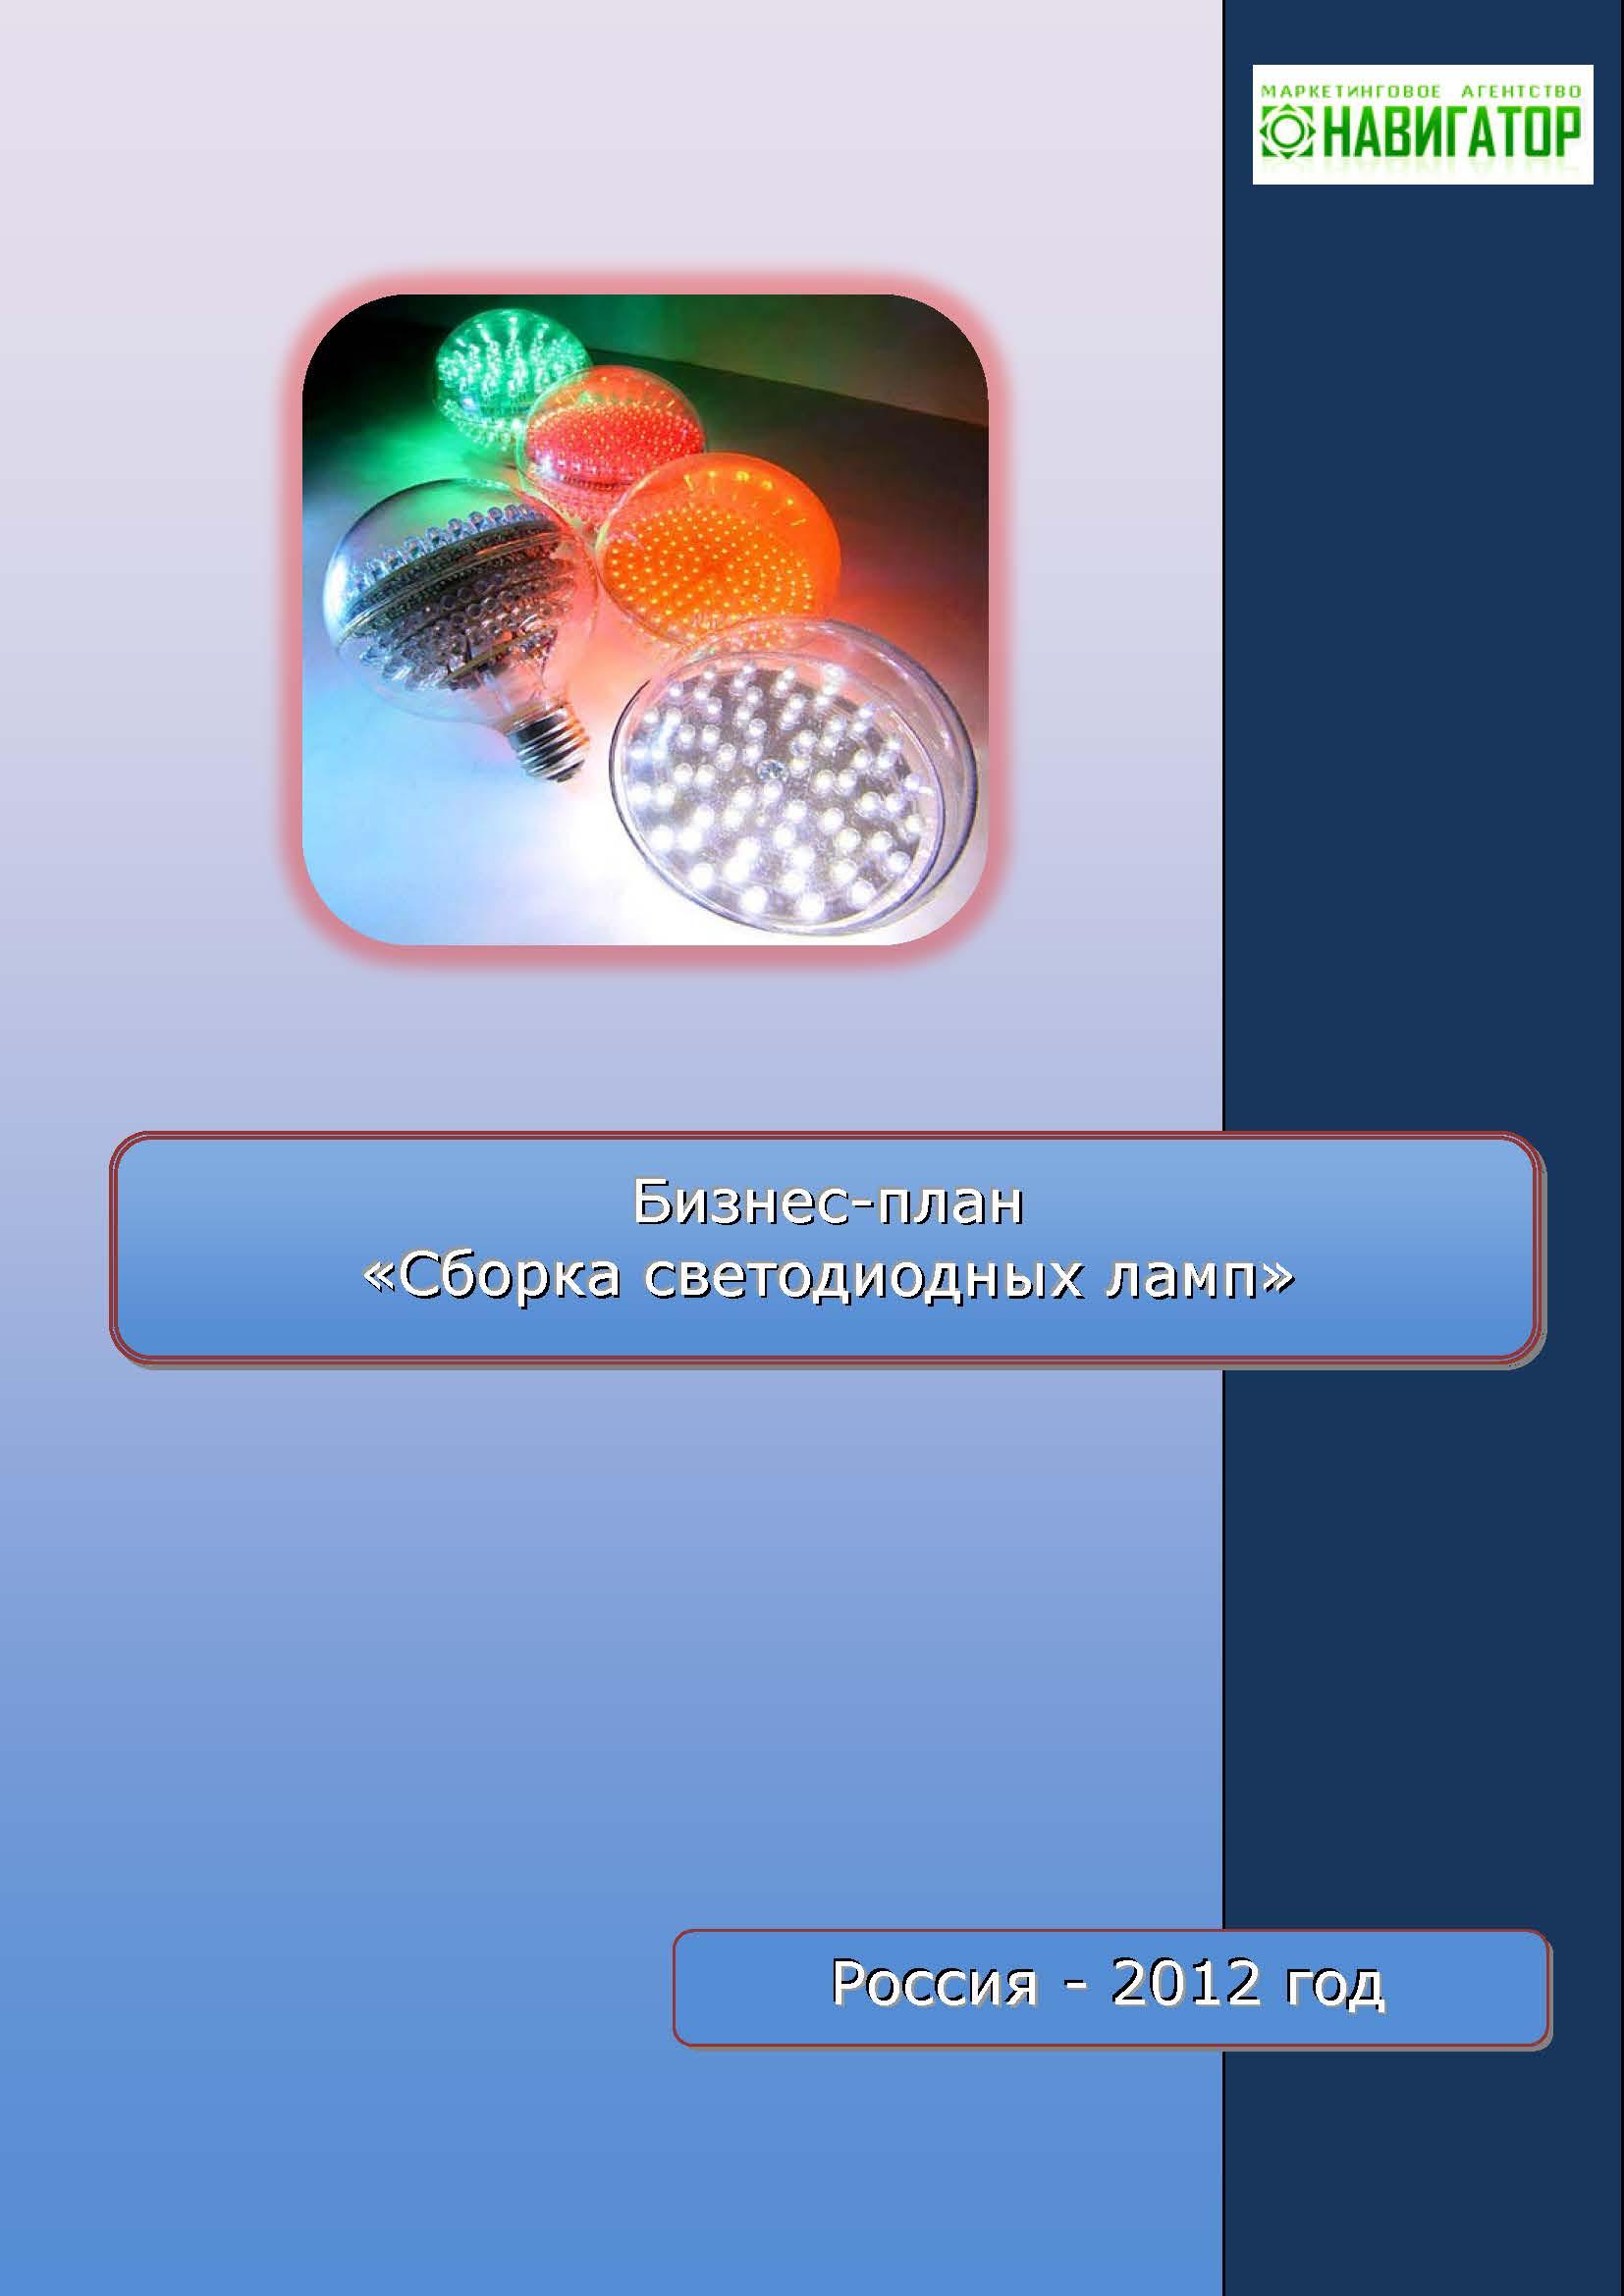 Продажа светодиодов бизнес план проектор бизнес план